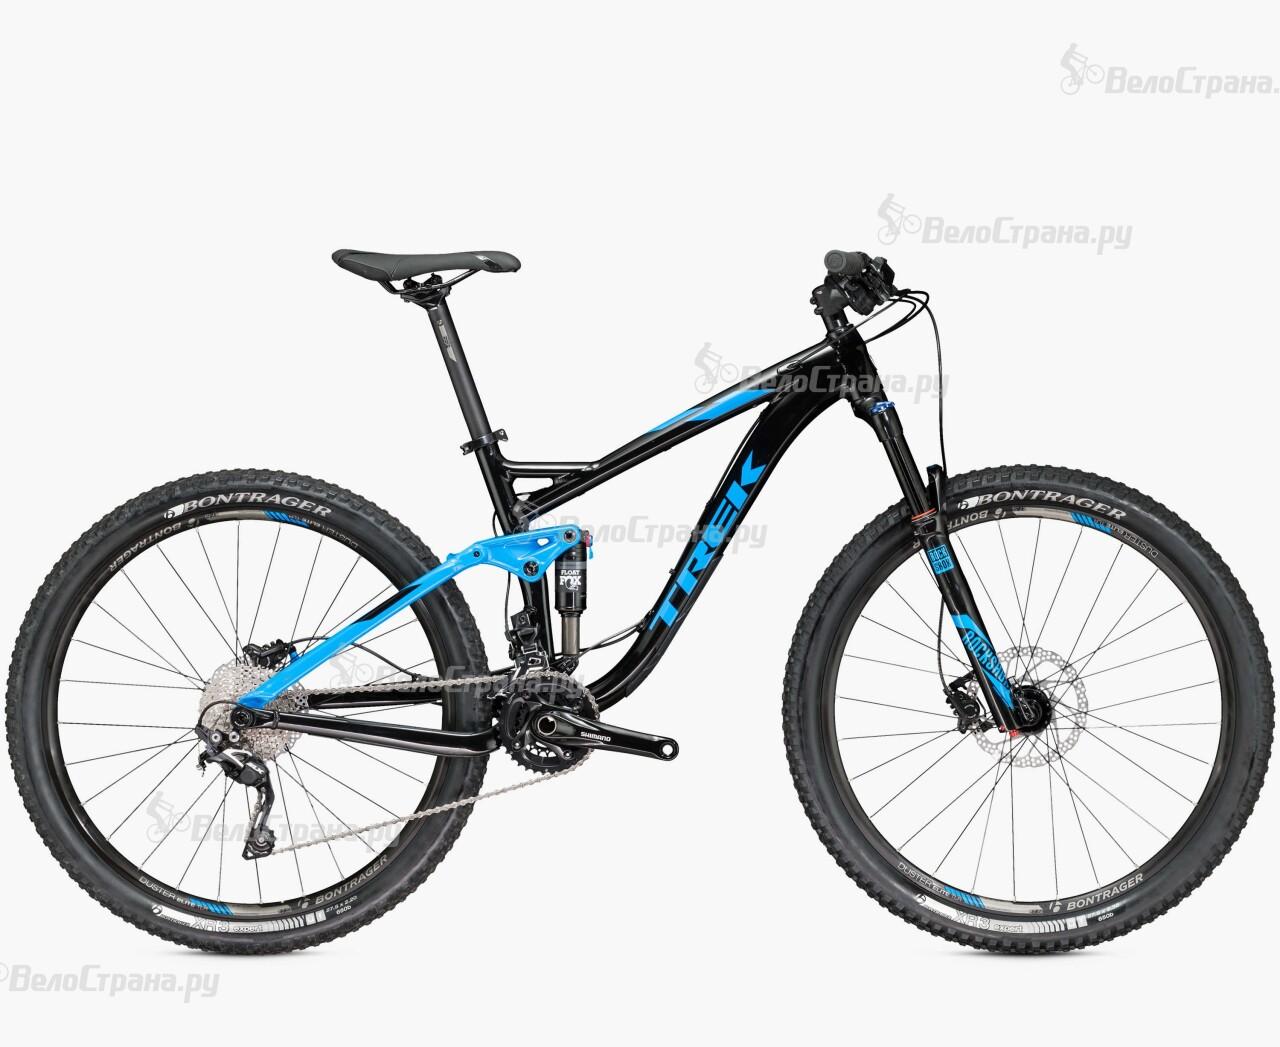 Велосипед Trek Fuel EX 7 27.5 (2016) trek fuel ex 9 27 5